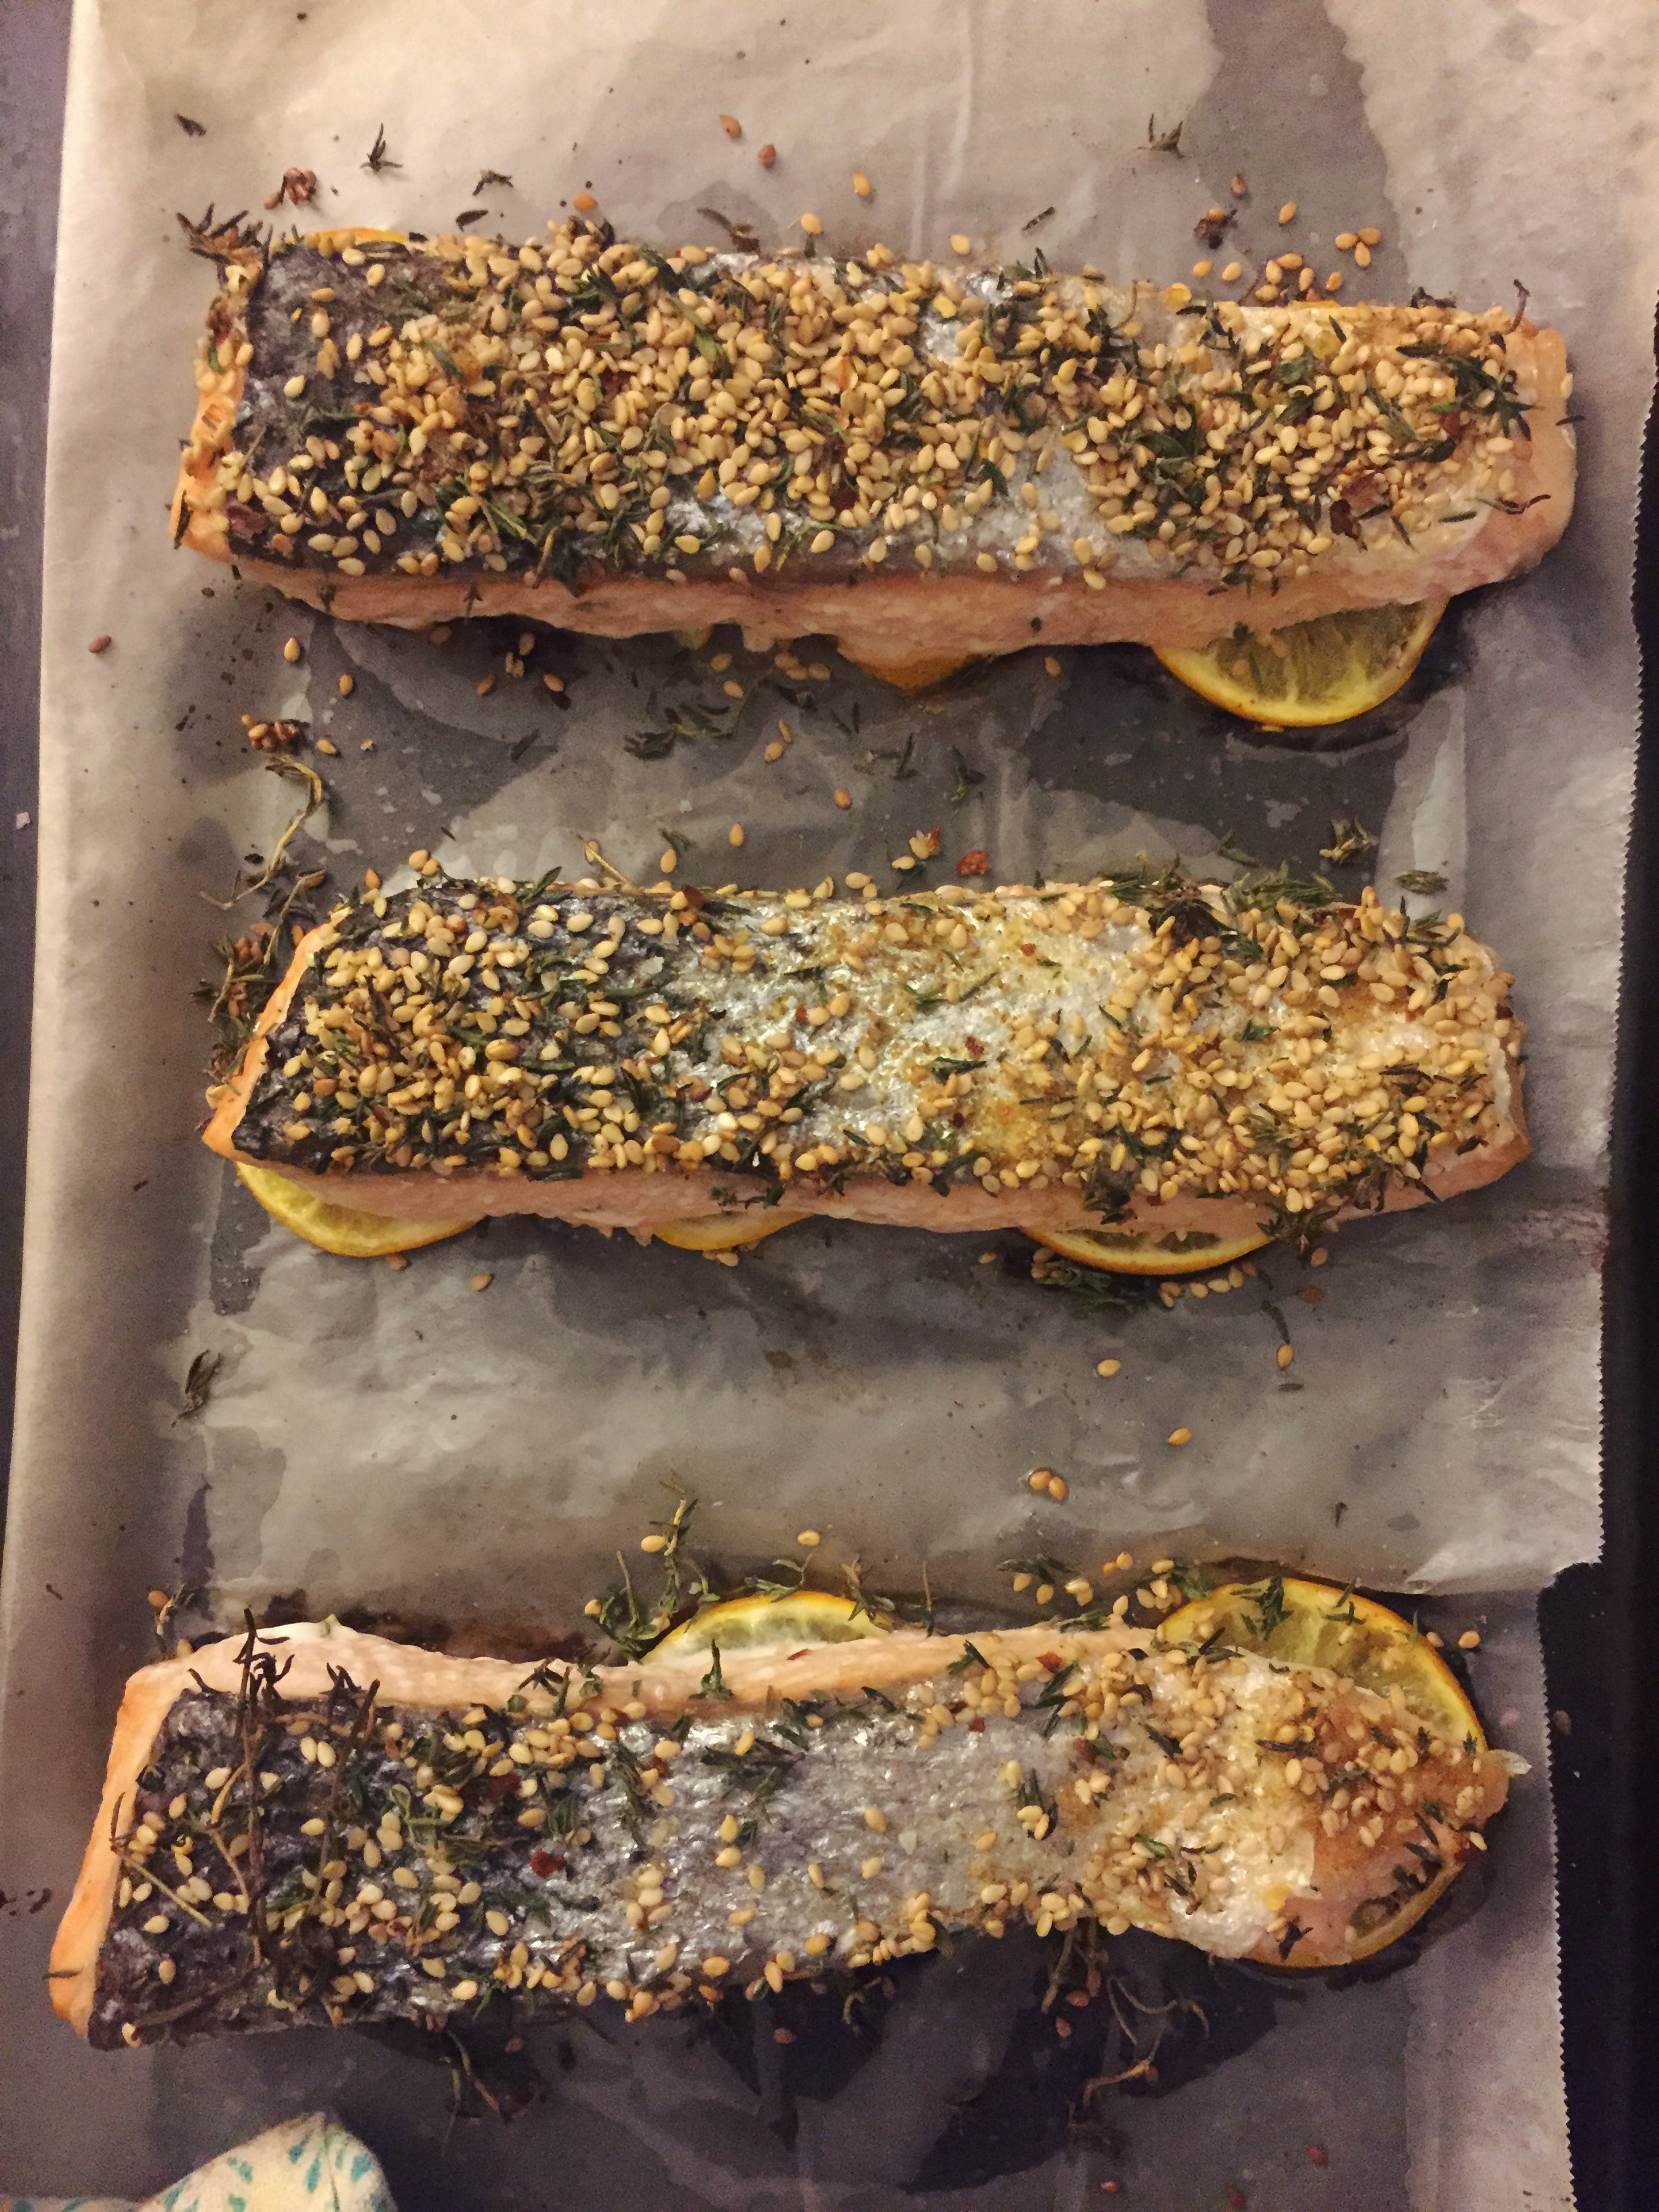 spice-salmon-kebab-grill